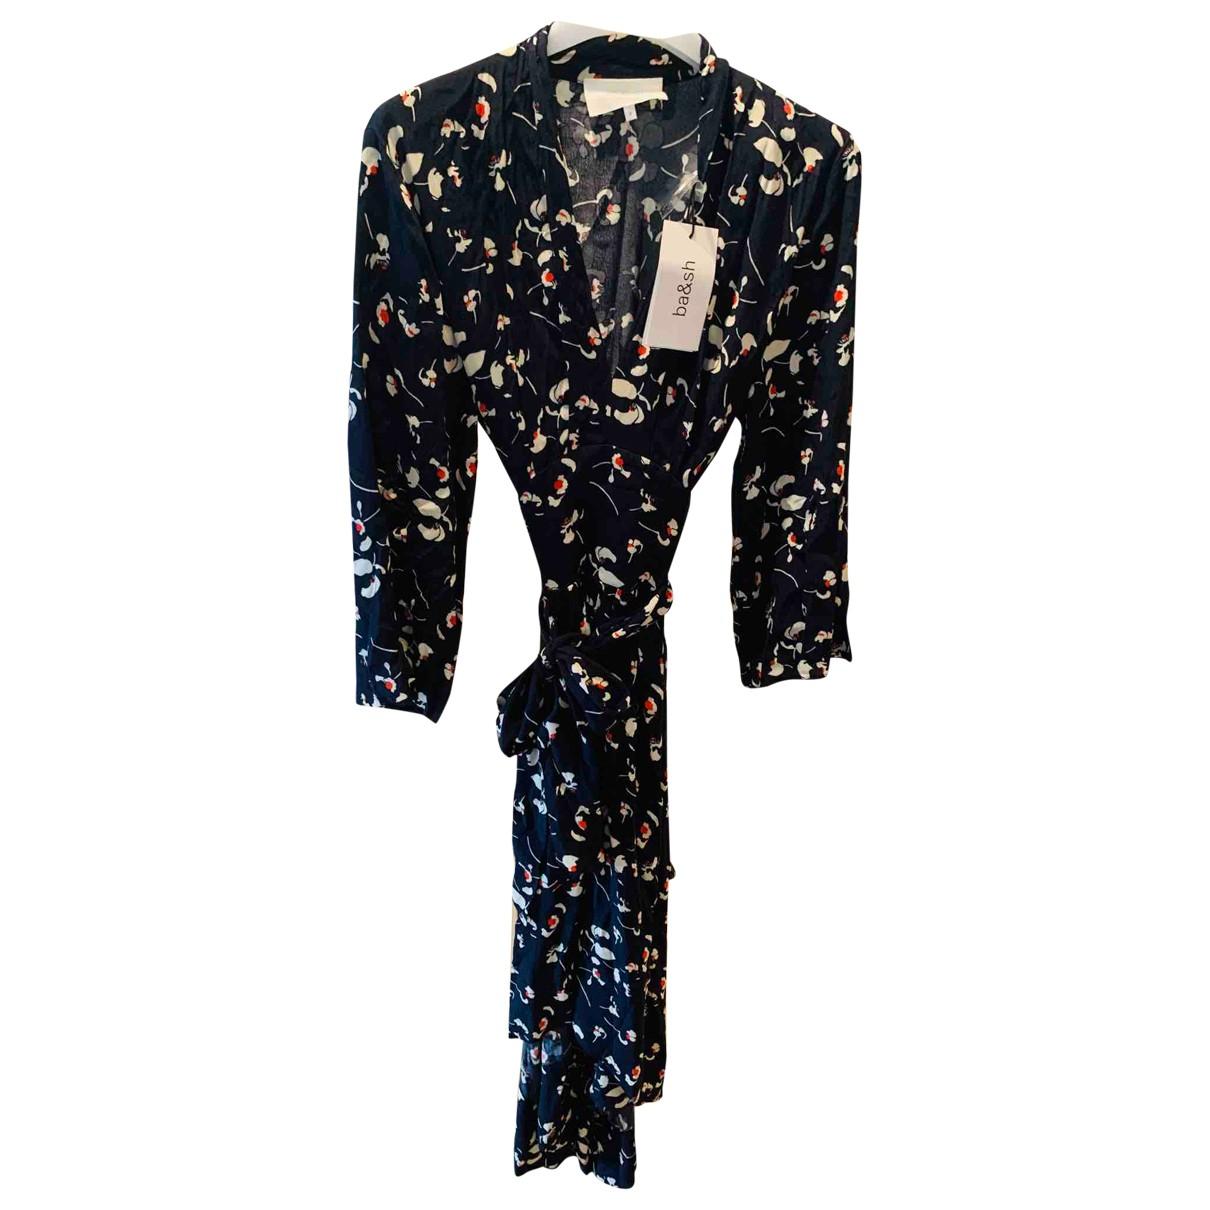 Ba&sh Fall Winter 2019 Blue dress for Women 40 FR